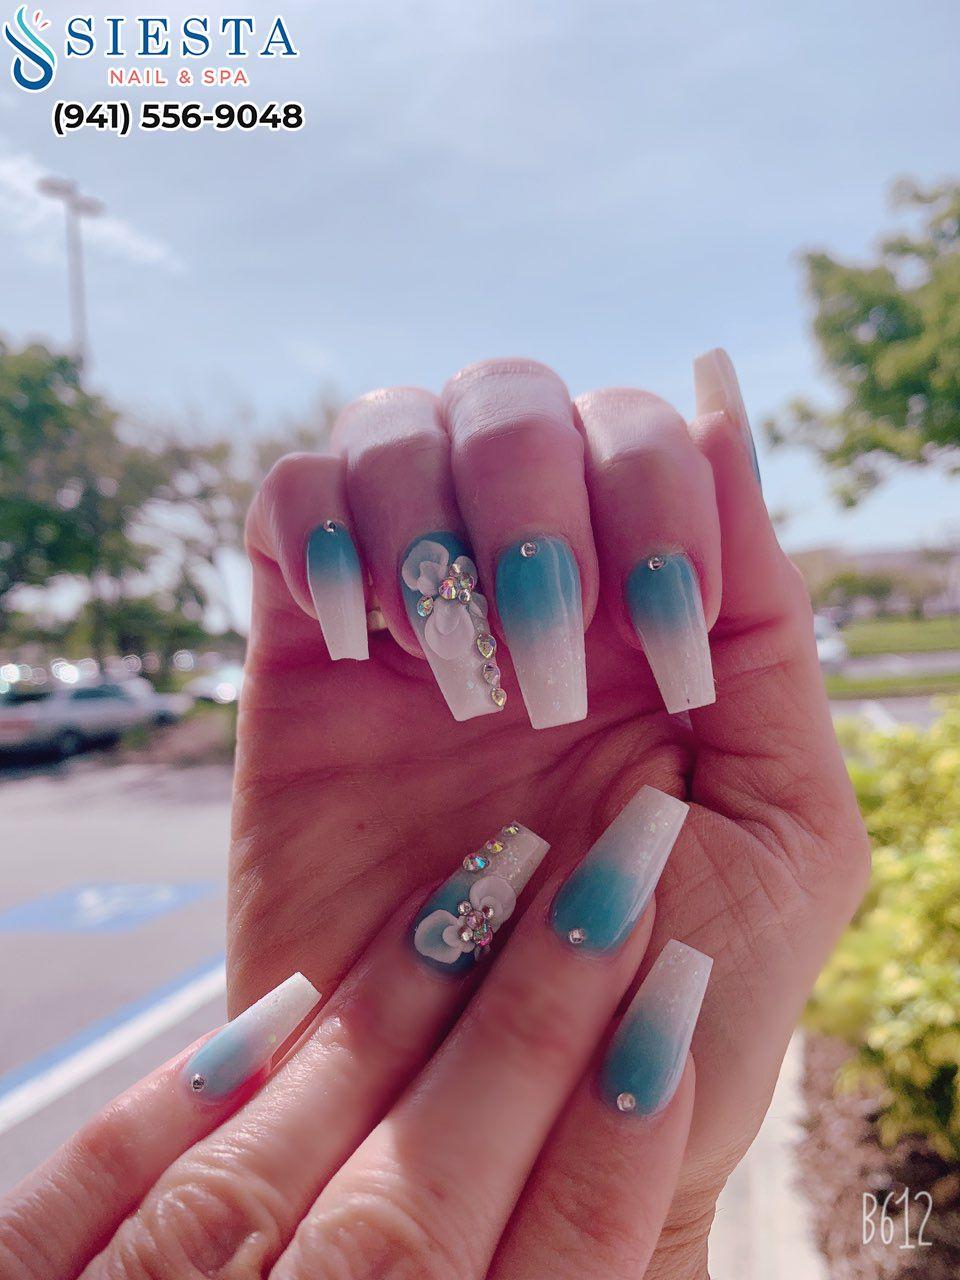 Siesta Nails And Spa Nagelstudio In Sarasota Florida 34231 Florida Nagelstudio Nails Sarasota Siesta Spa Nail Spa Sarasota Florida Nails